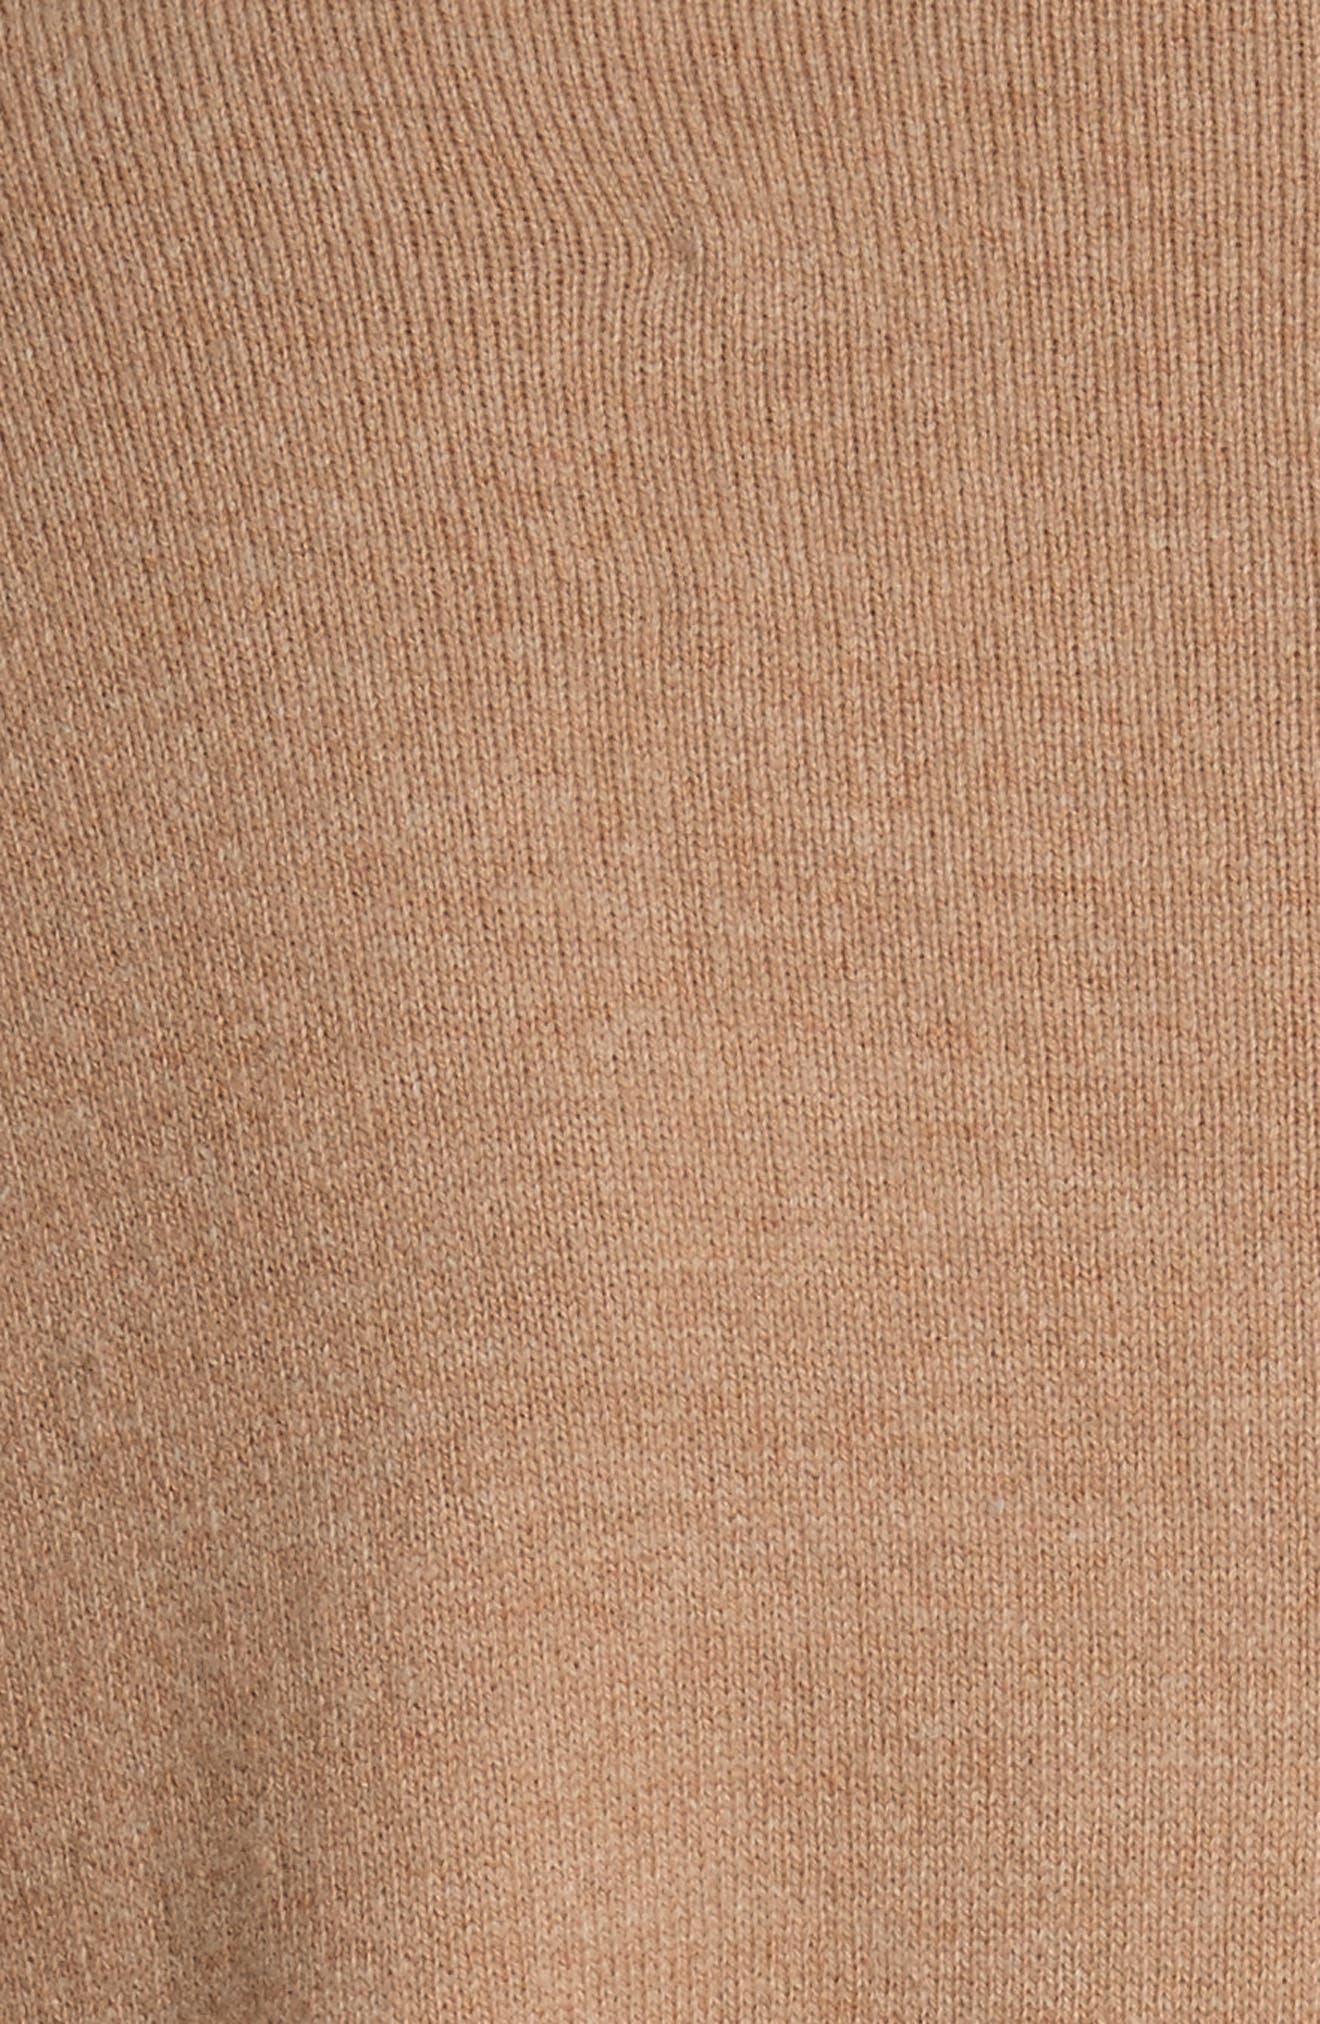 Piota Wool Blend Knit Trench Coat,                             Alternate thumbnail 6, color,                             231